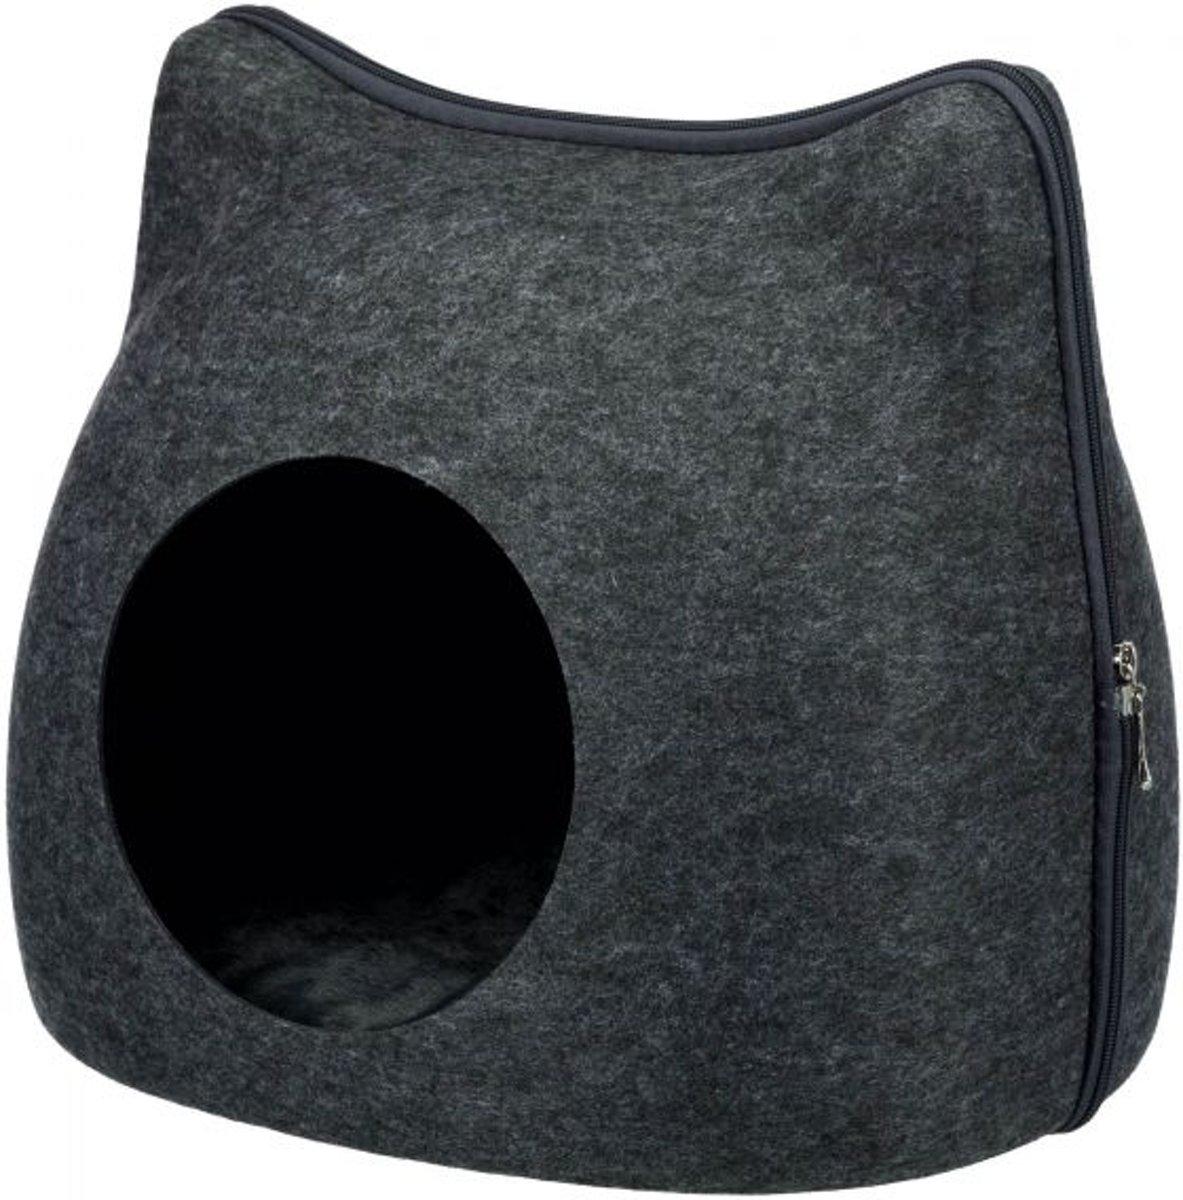 Trixie Relax Iglo Cat Kattenmand - Vilt - Antraciet - 38 x 35 x 37 cm